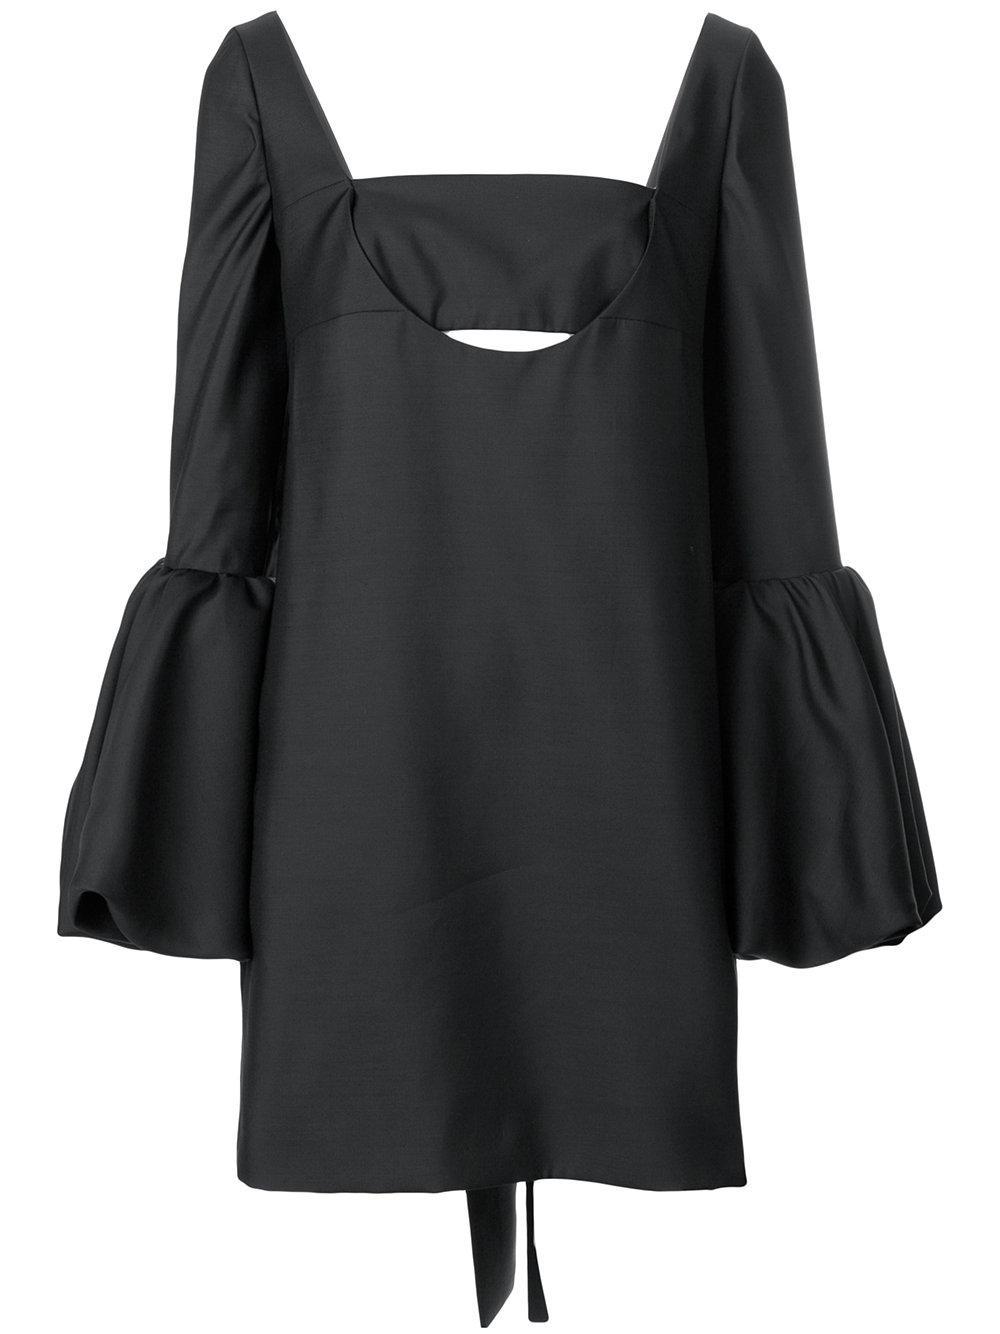 Off Shoulder Bell Sleeve Dress Item # PB0VAI9541D